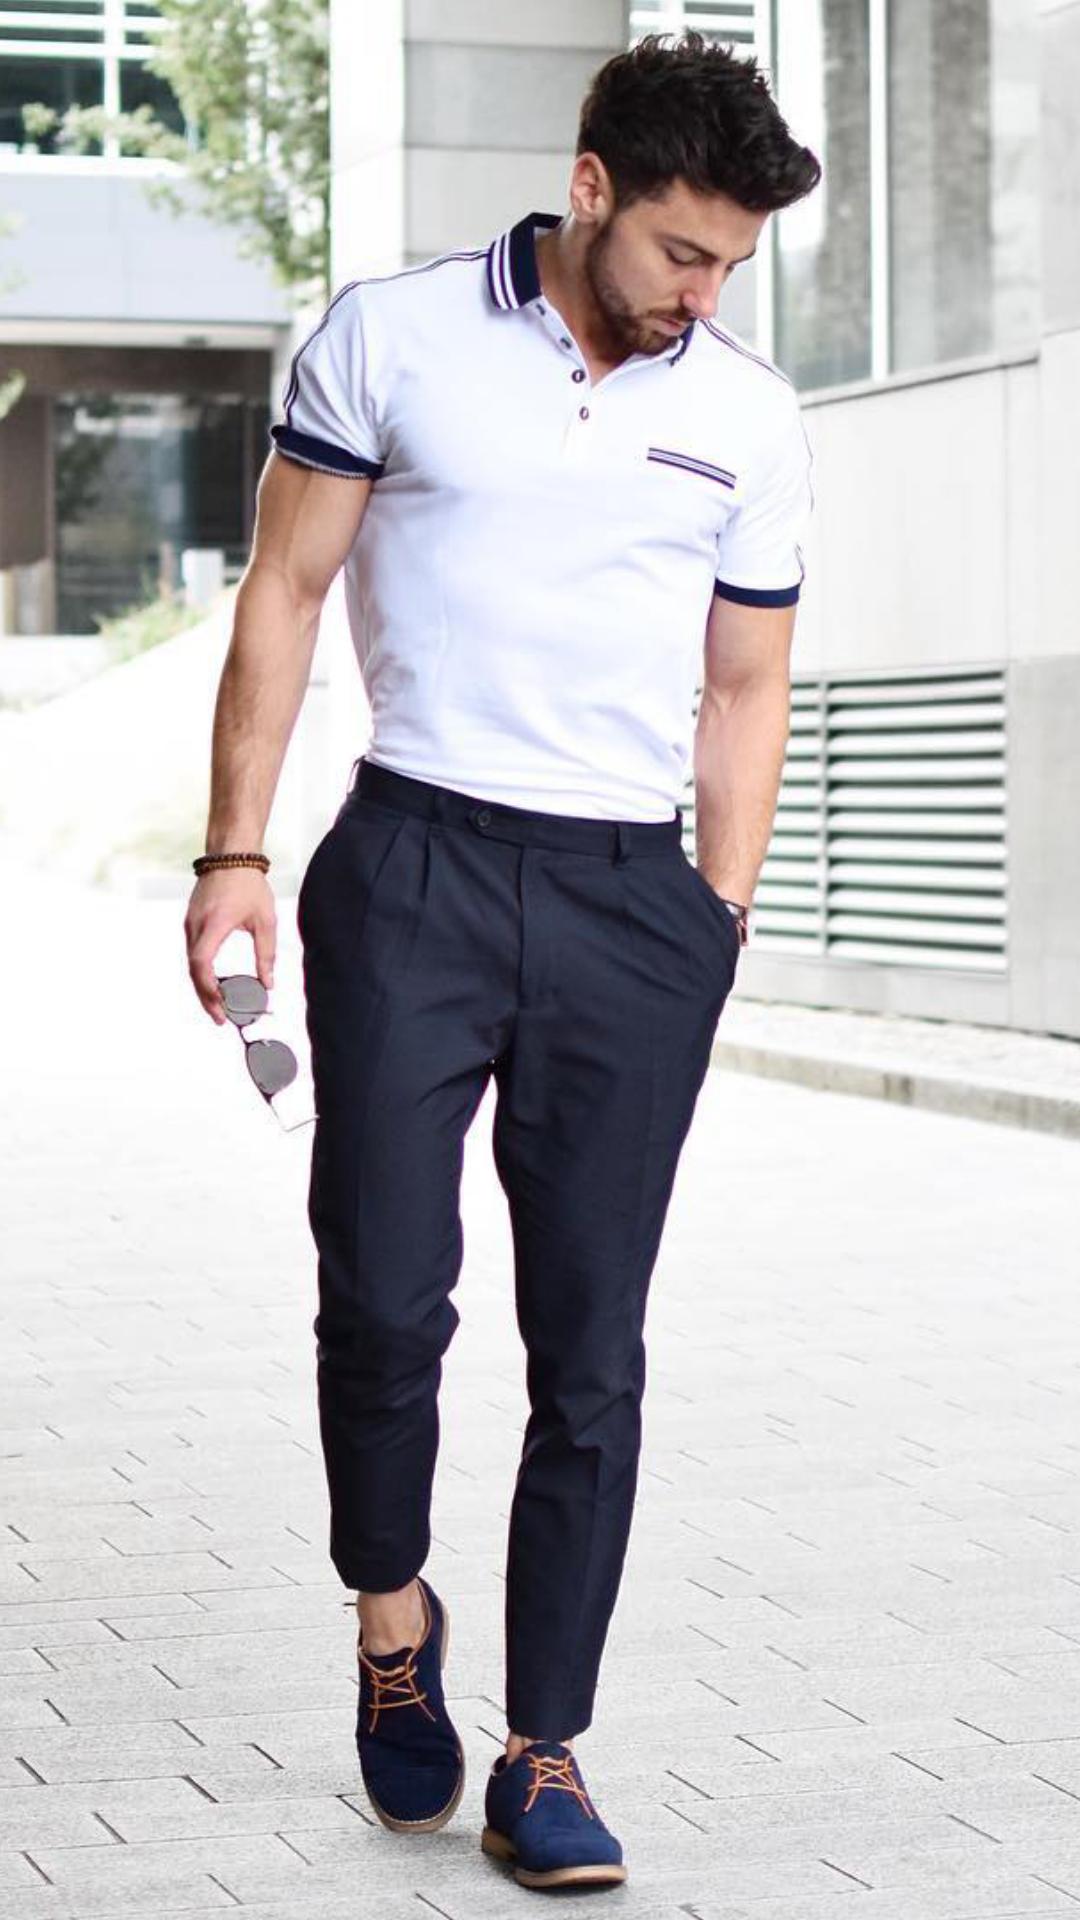 White Polo Shirt Outfit Ideas For Men | Polo shirt outfits